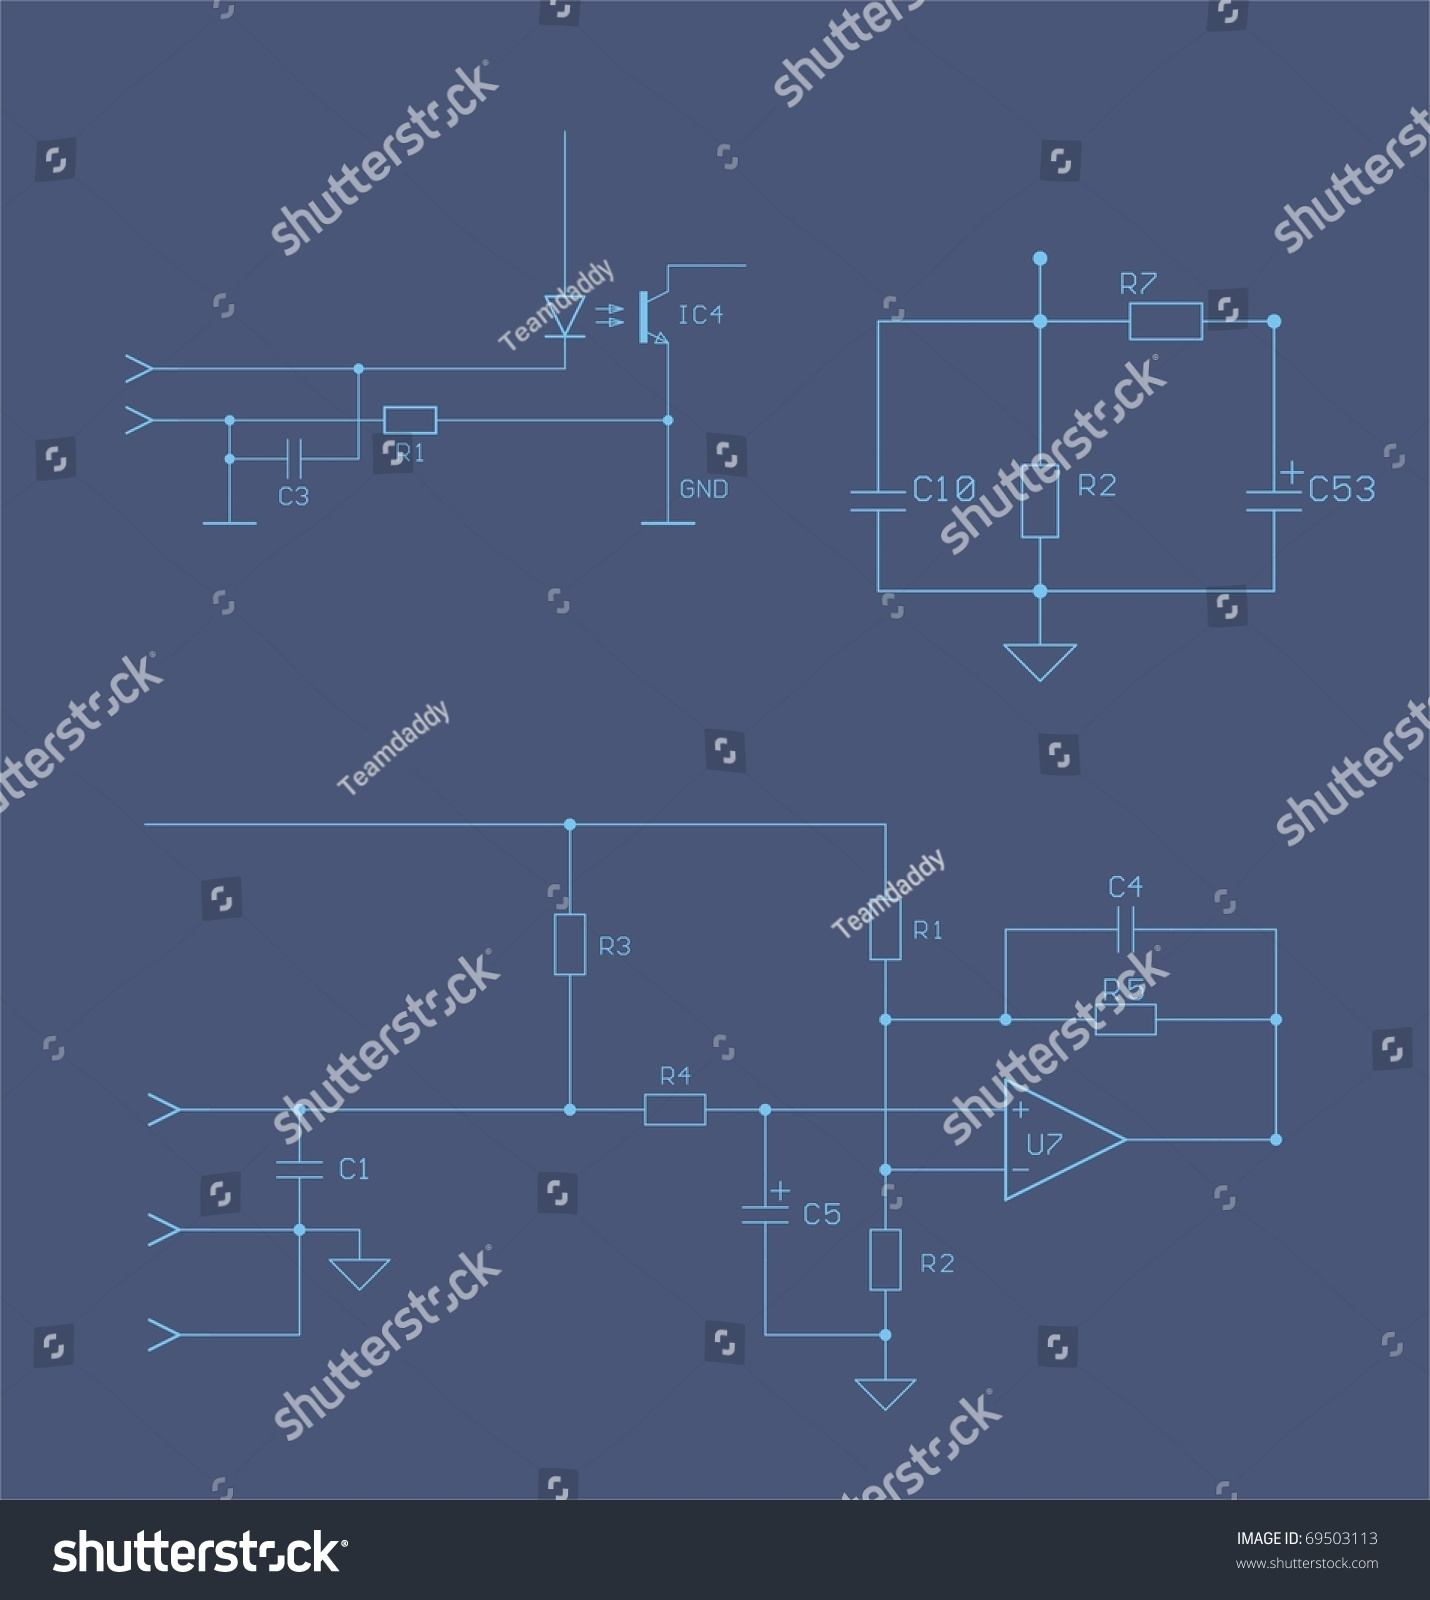 Electronic Schematic Blueprint Circuits Resistor Capacitors Stock ...